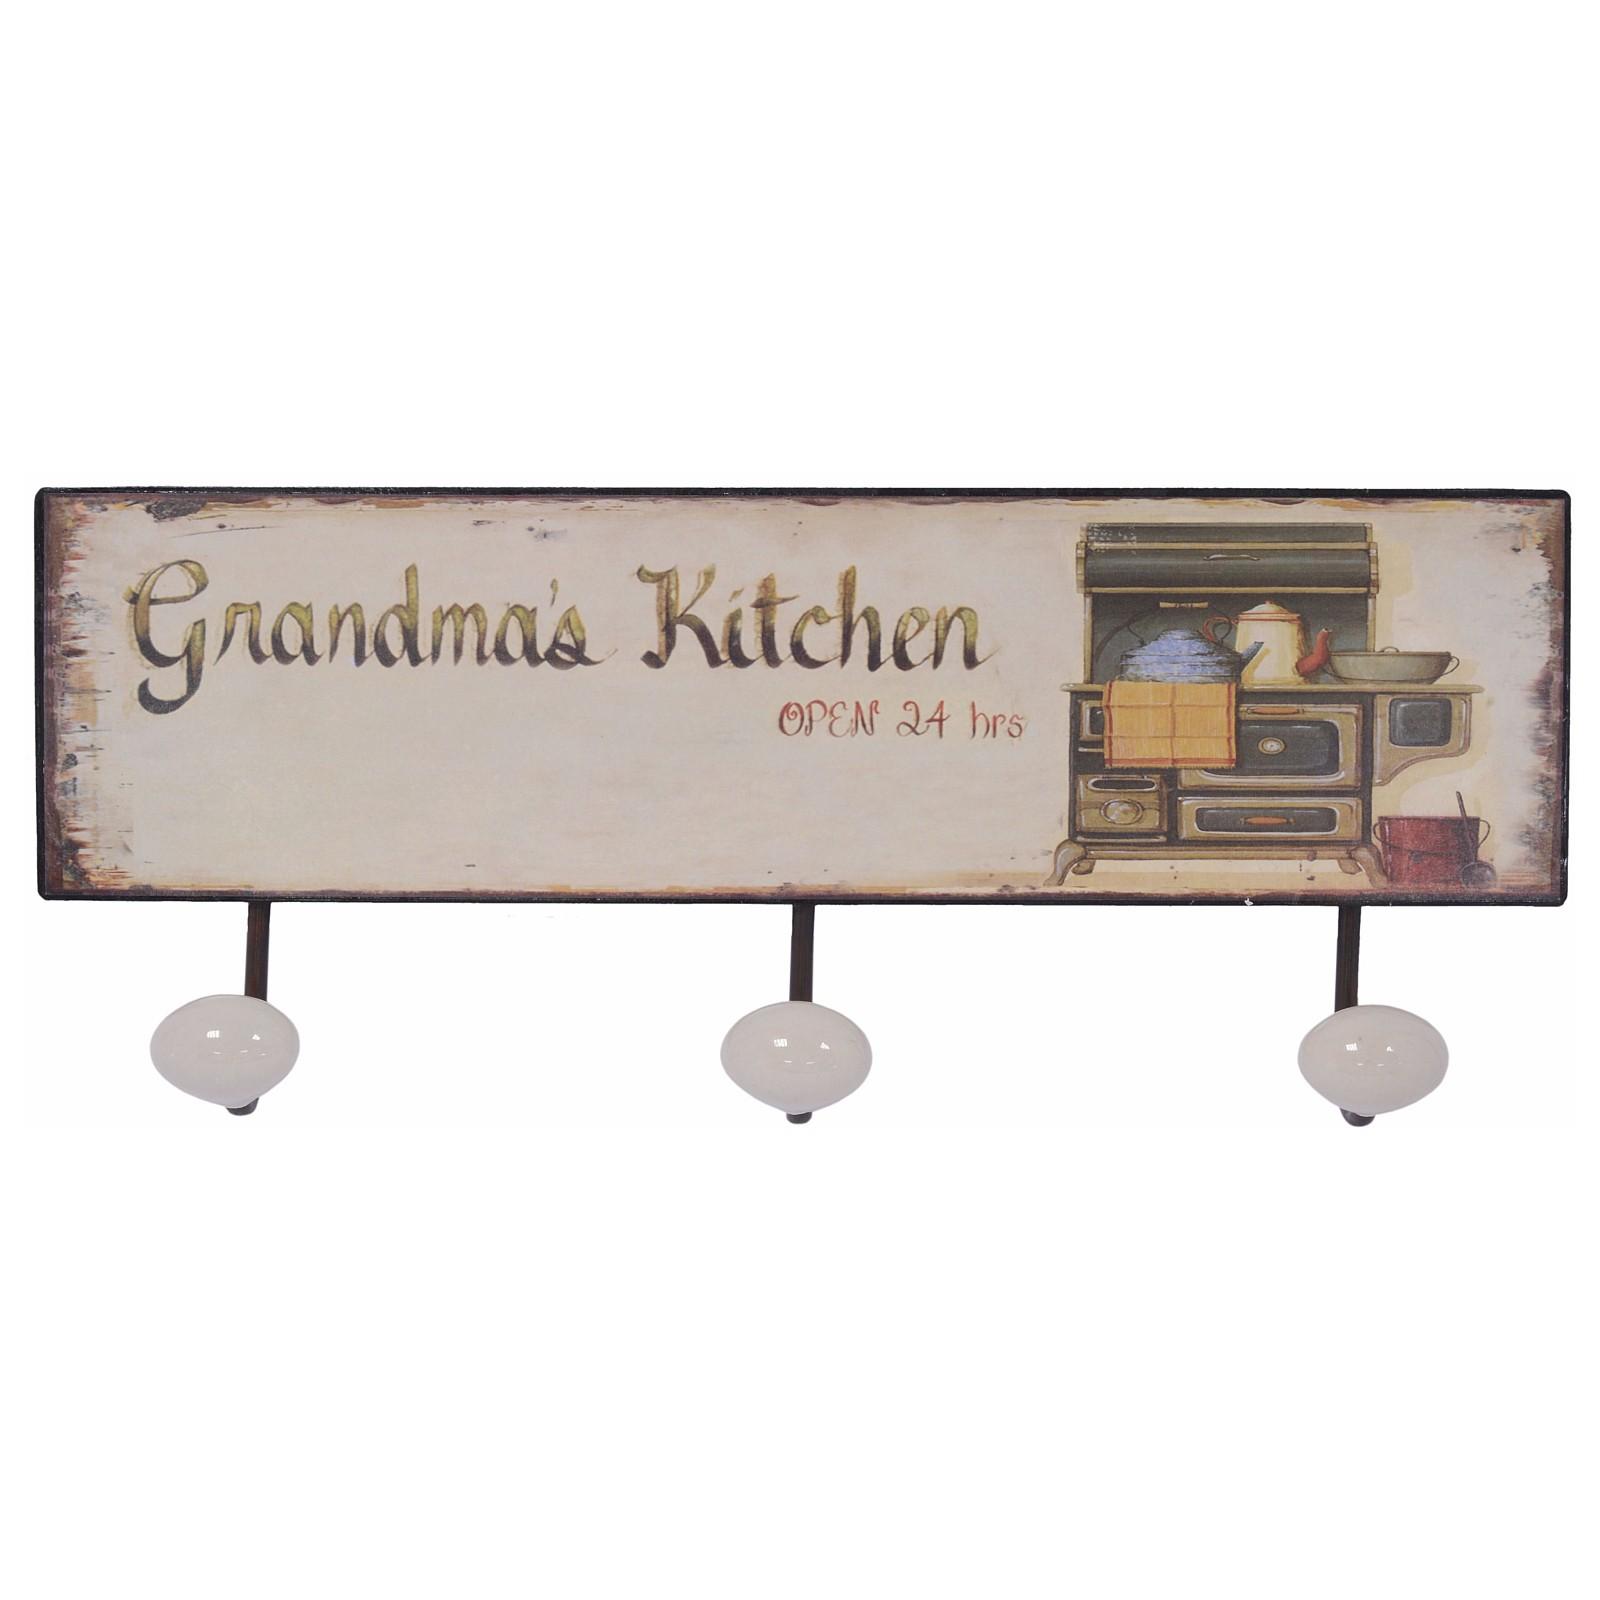 k chen wandhaken metall grandma 39 s kitchen haken 3er hakenleiste handtuchhalter. Black Bedroom Furniture Sets. Home Design Ideas